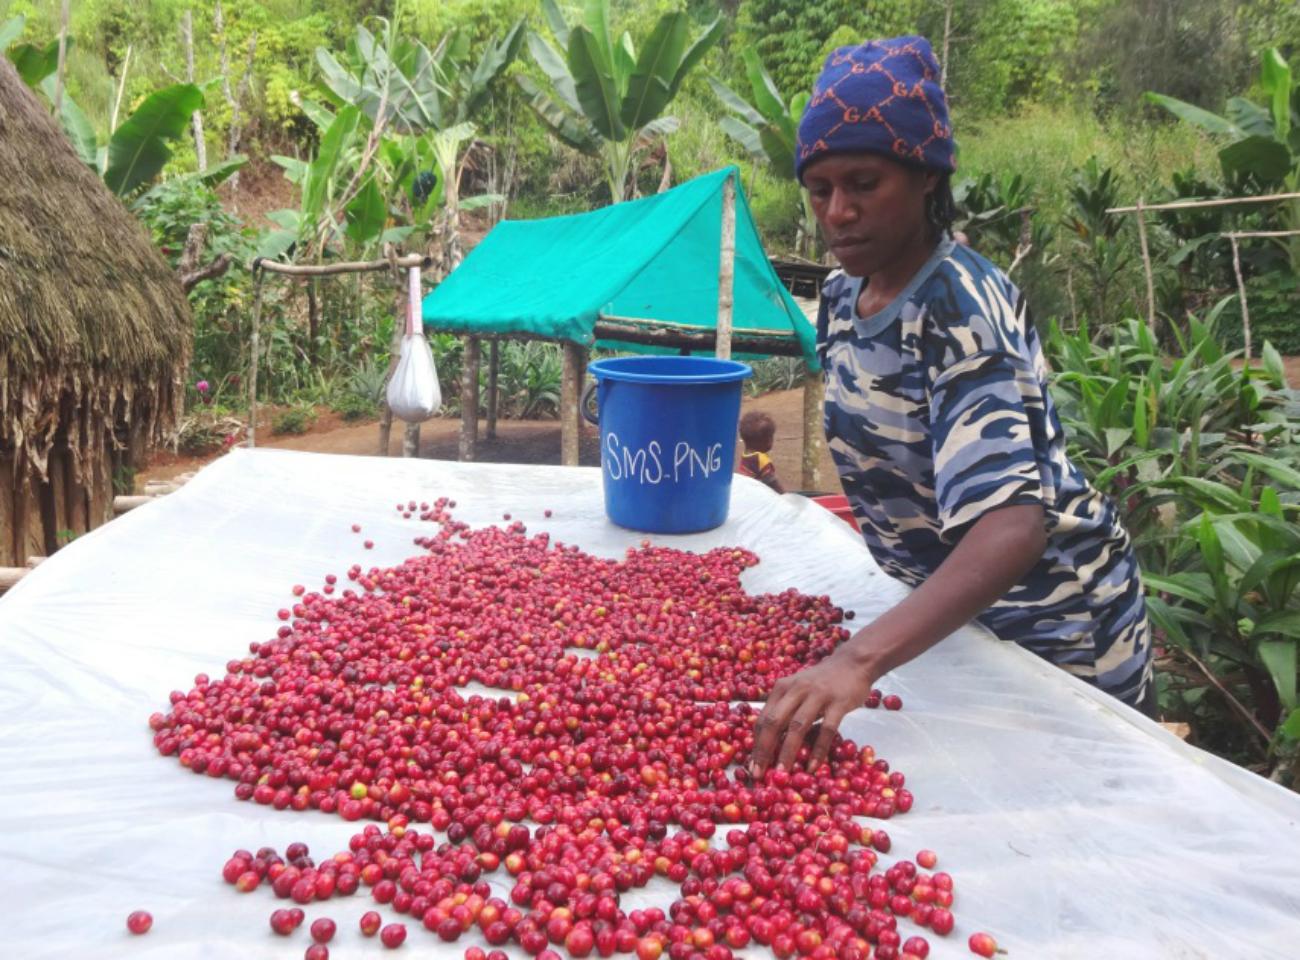 Fairtrade farming sorting cherries